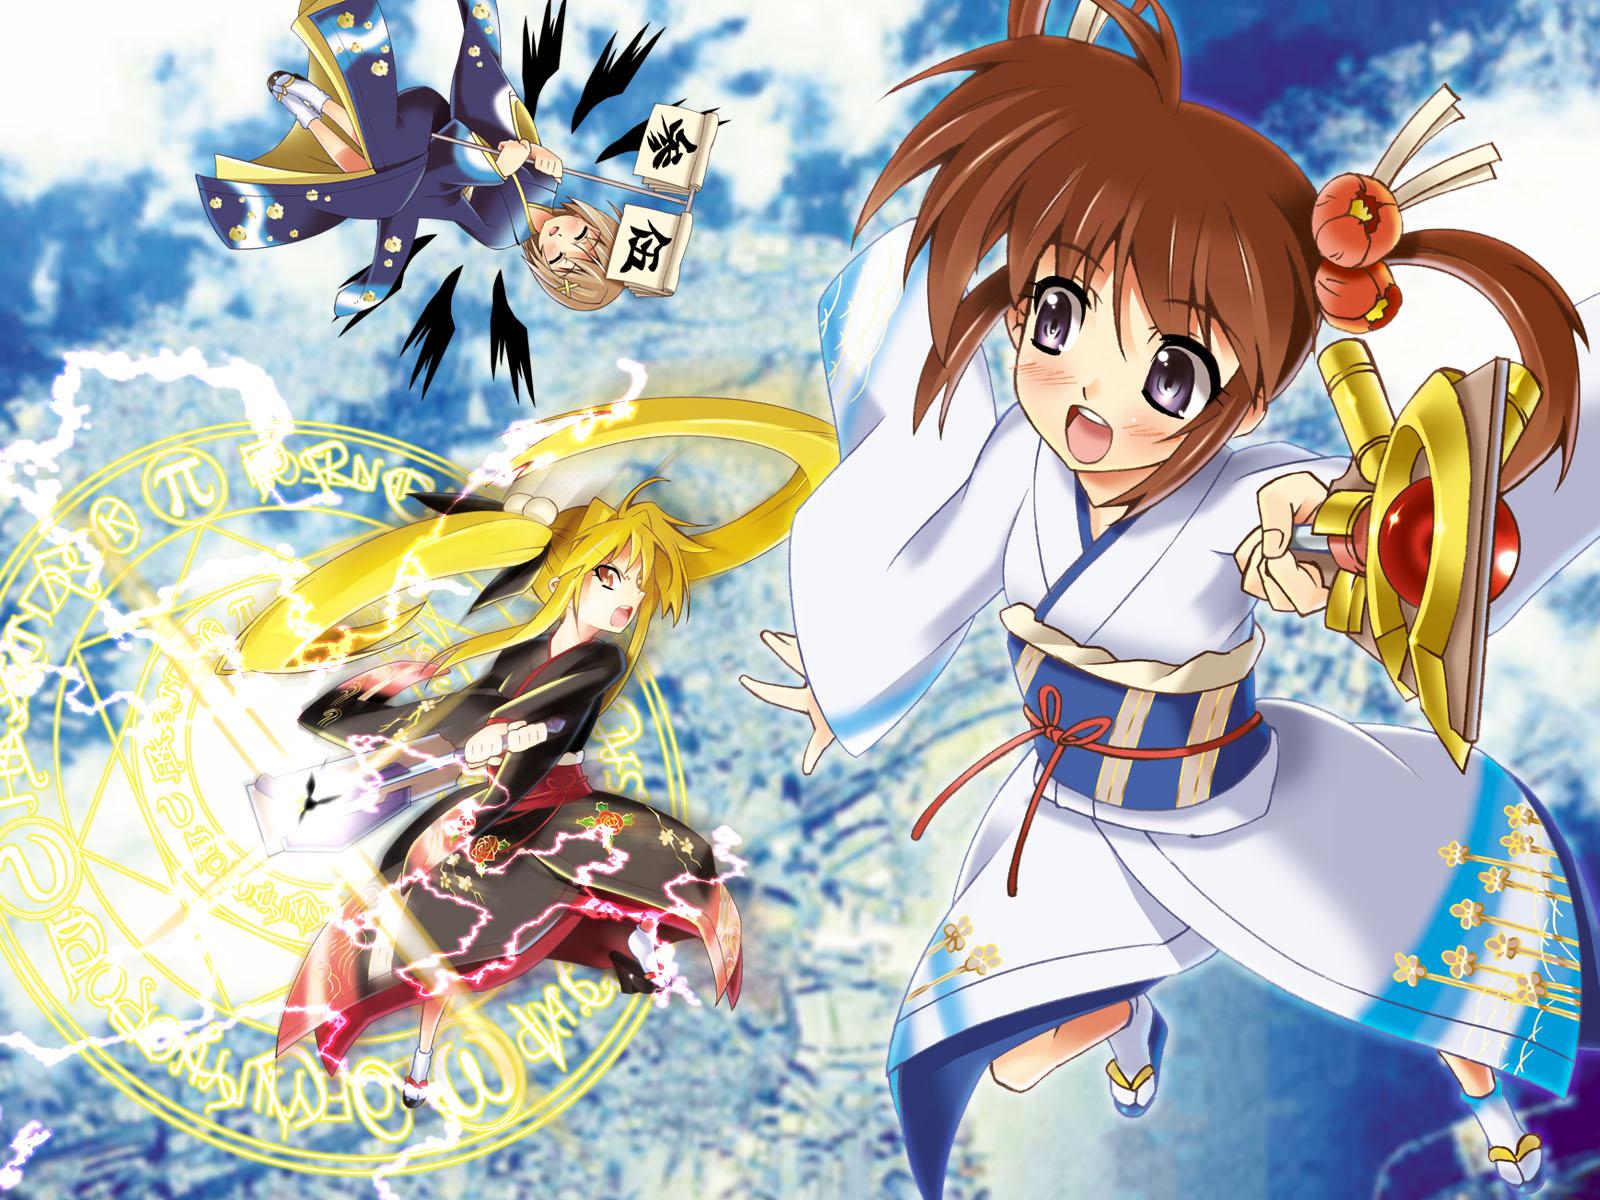 fate_testarossa mahou_shoujo_lyrical_nanoha takamachi_nanoha yagami_hayate